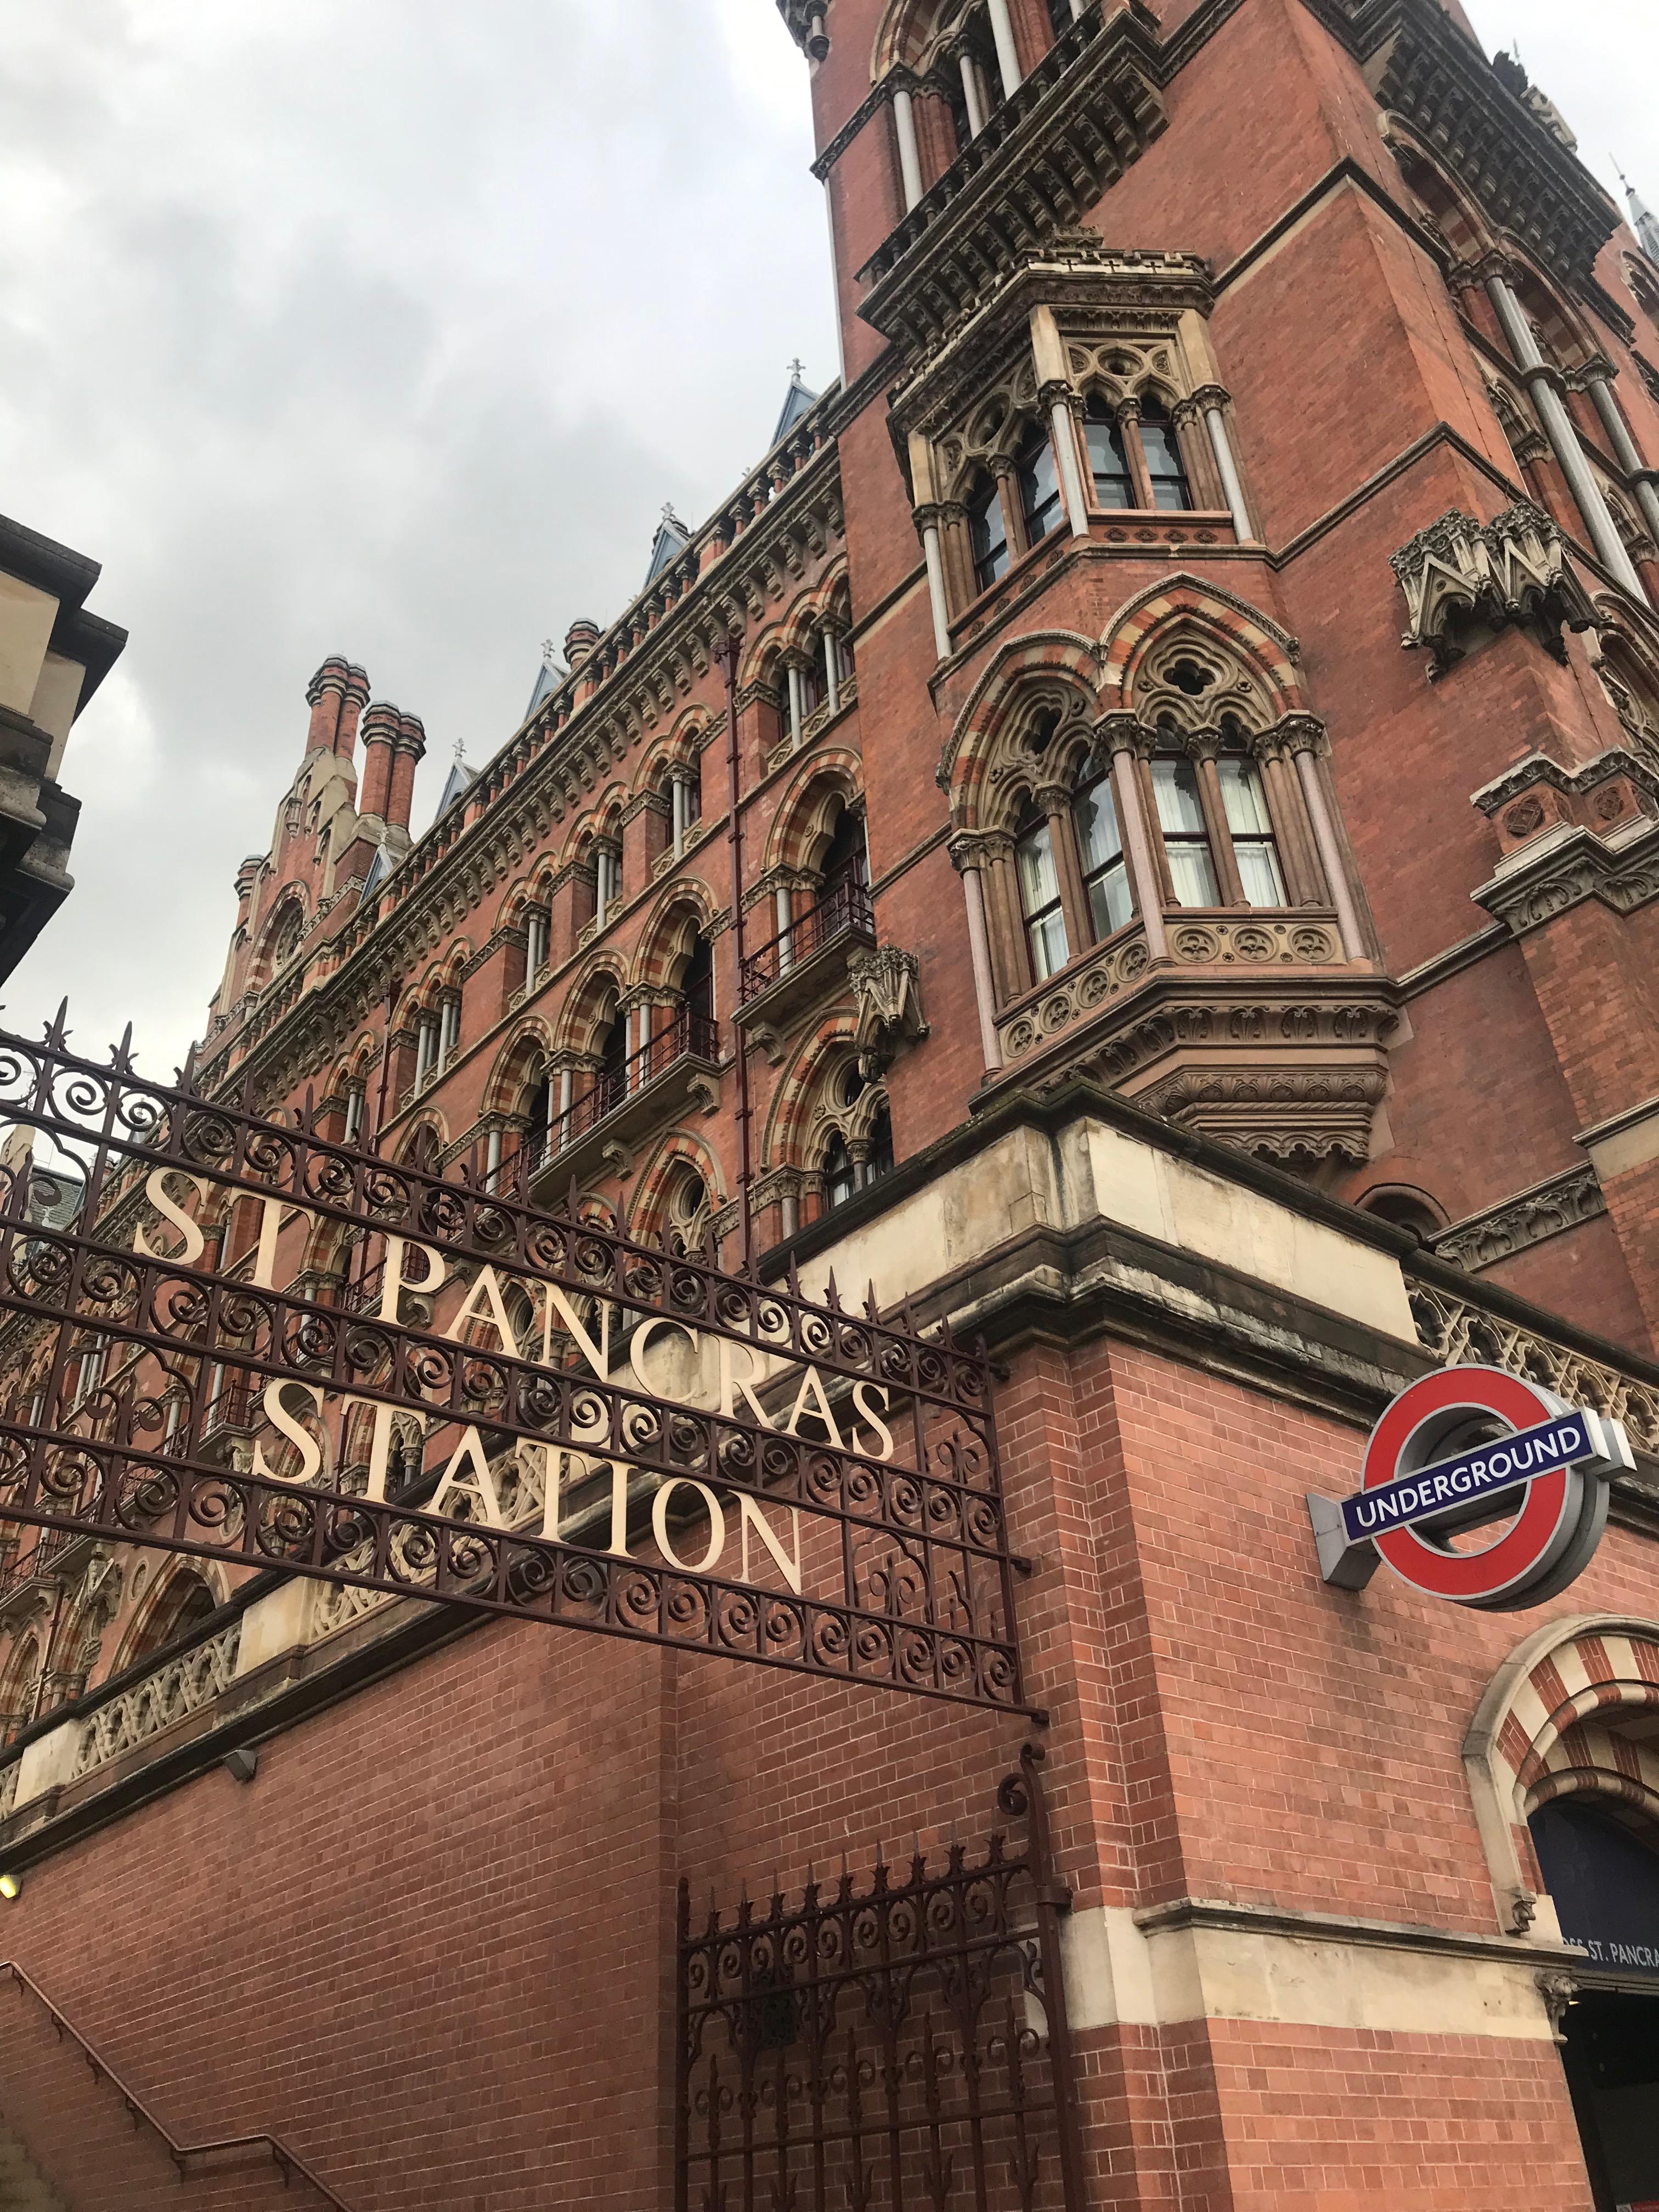 Arrivati a Londra alla Stazione di San Pancrazio , Protettore di Taormina!